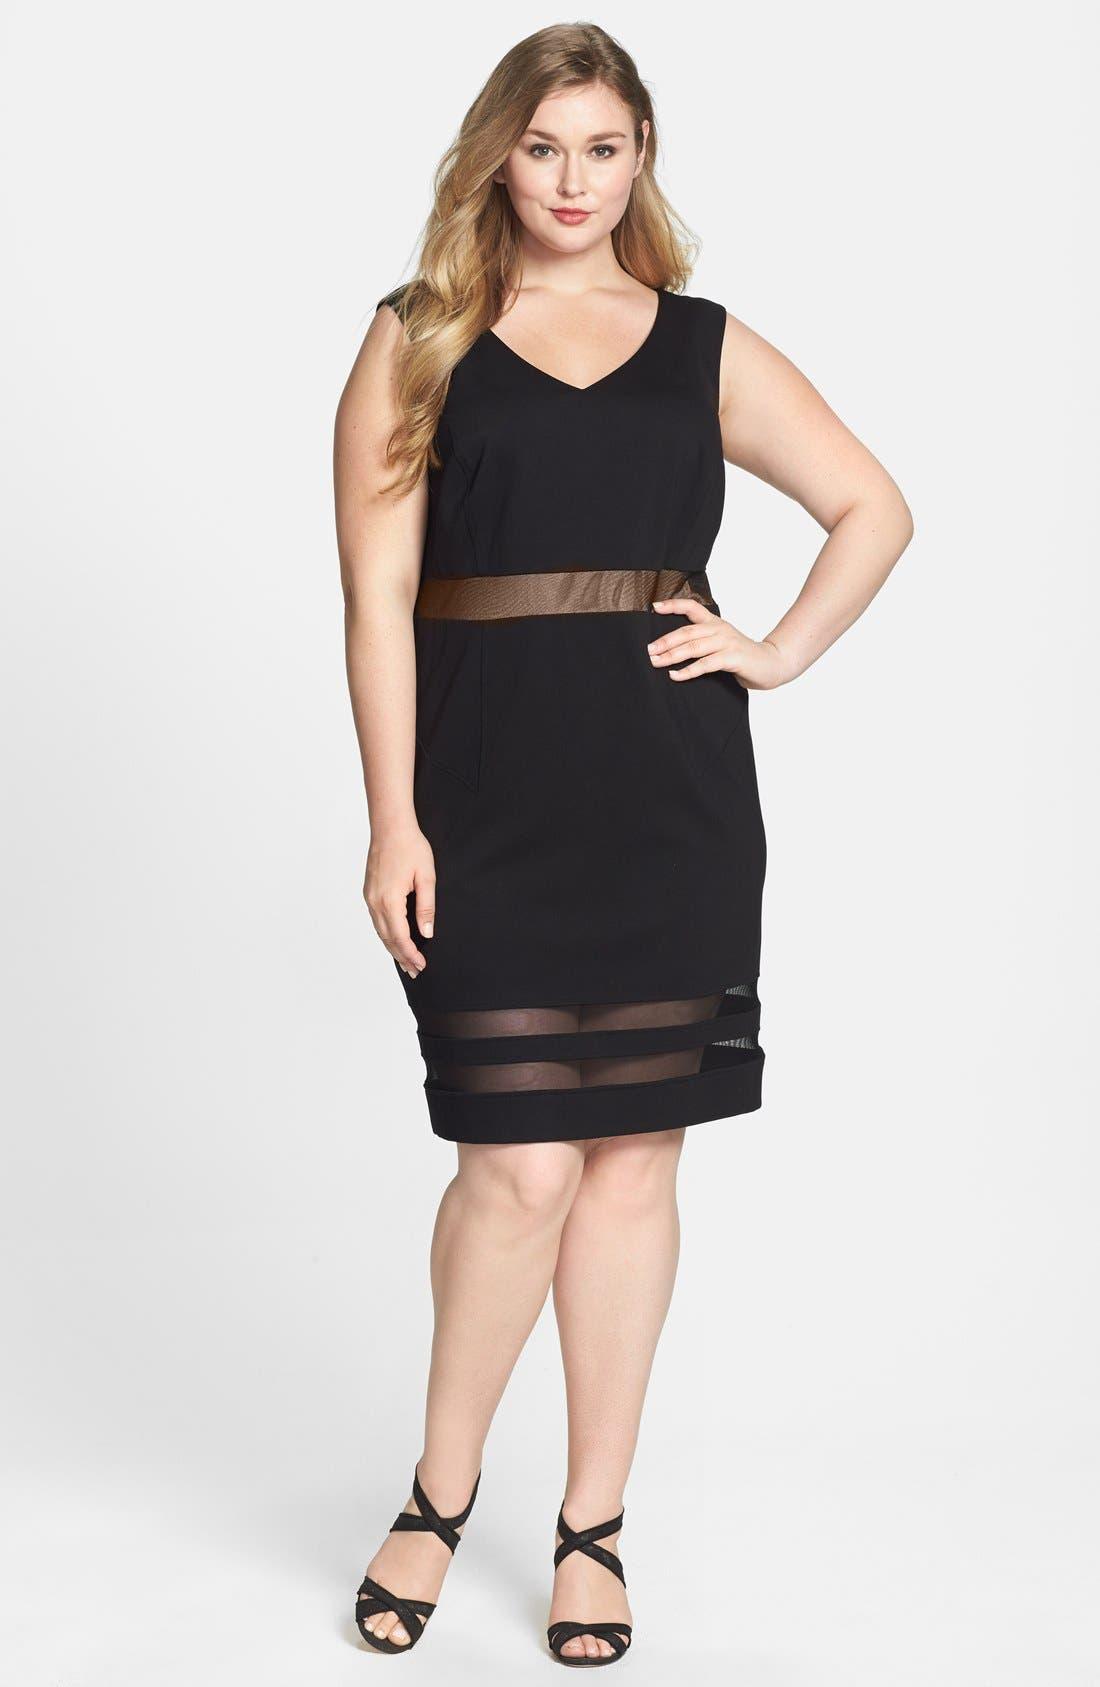 Alternate Image 1 Selected - ABS by Allen Schwartz Illusion Stripe V-Neck Dress (Plus Size)